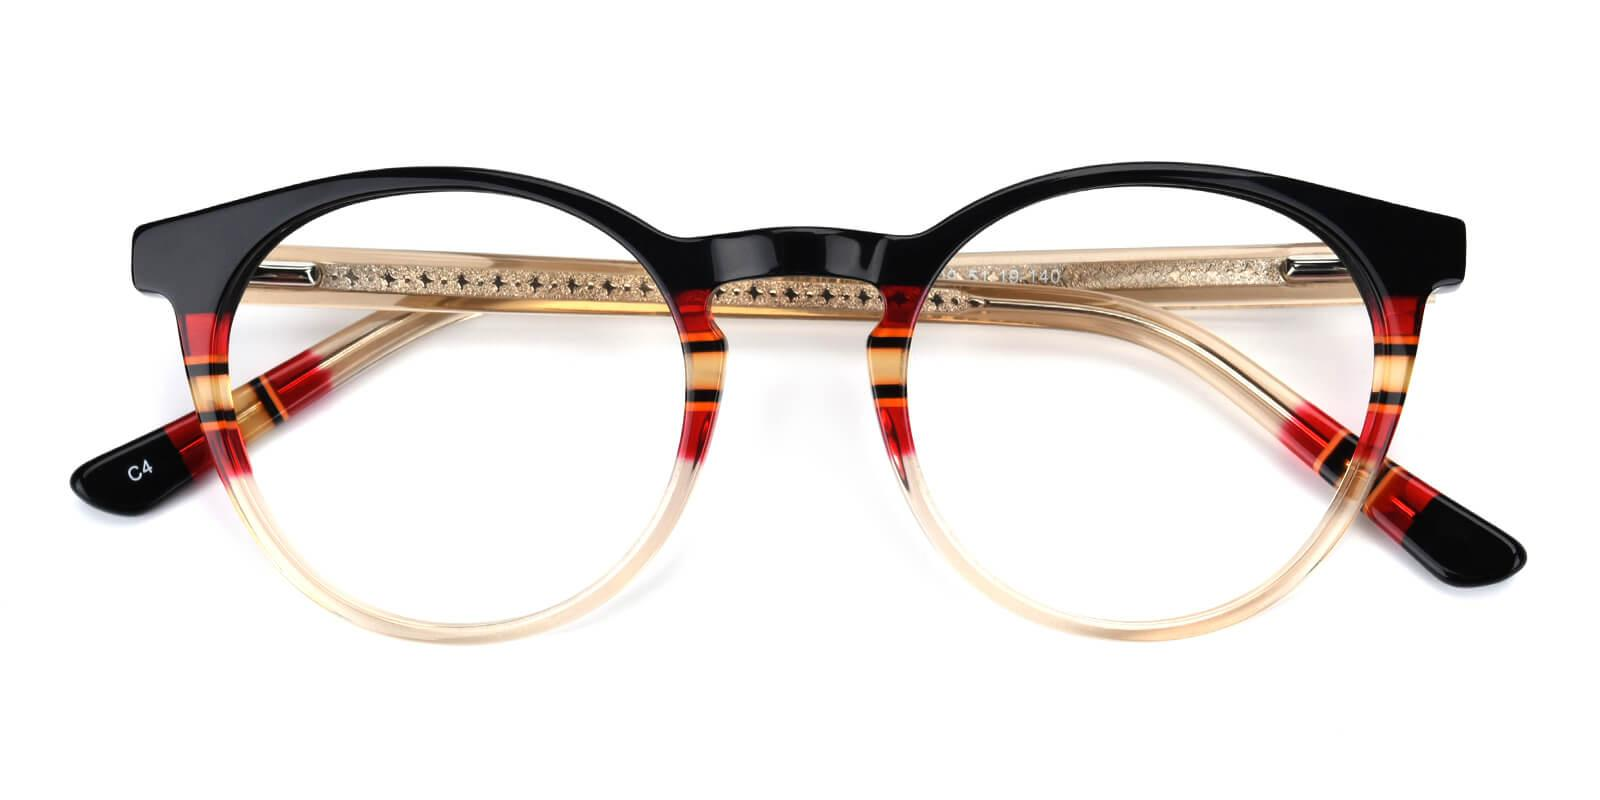 Gabrielle-Black-Round-Acetate-Eyeglasses-detail